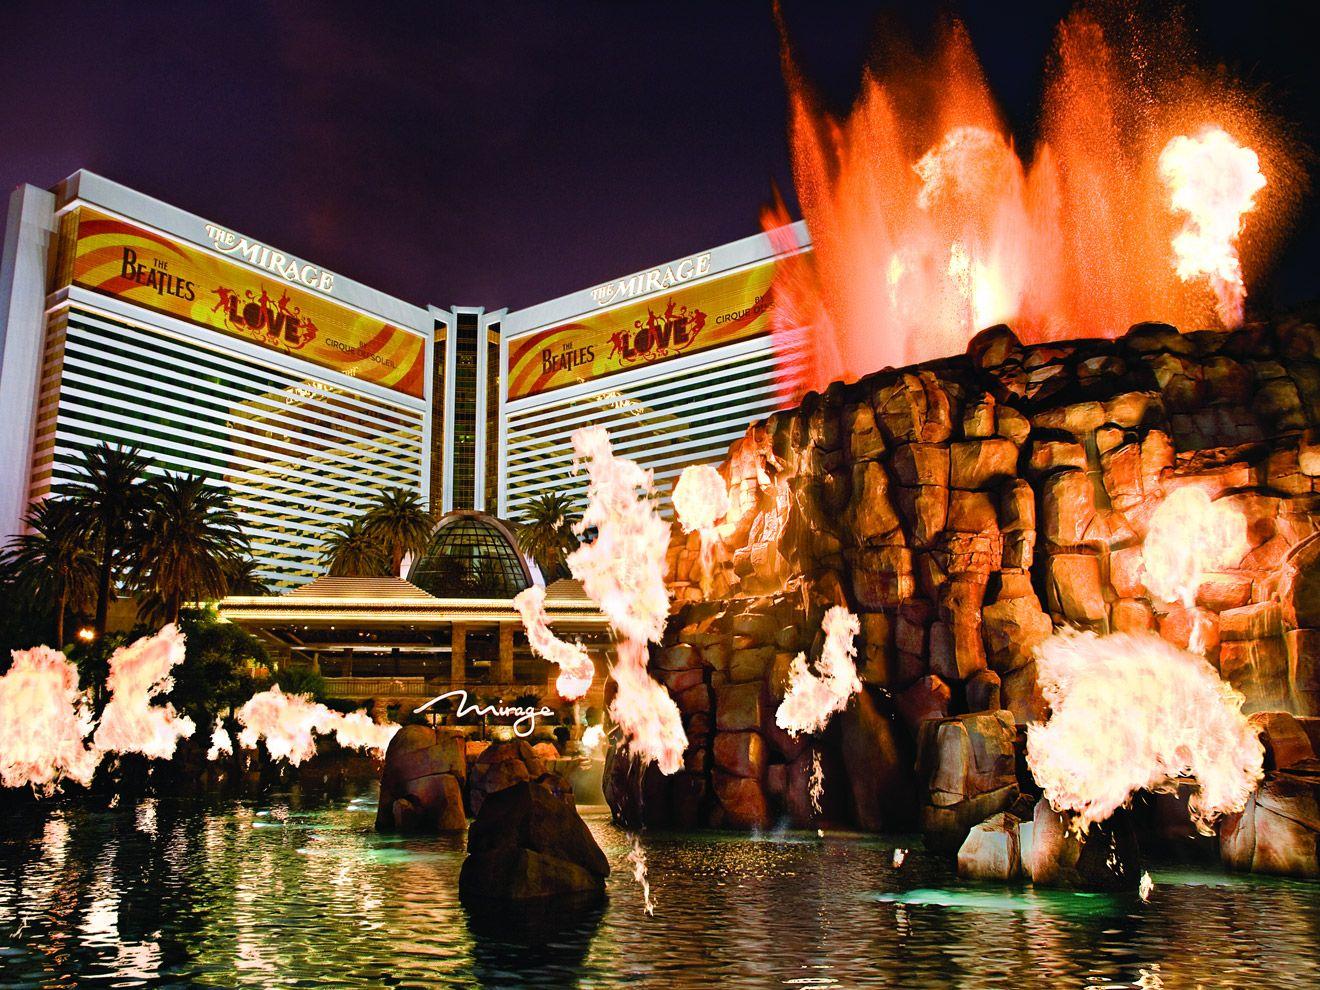 Mirrage hotel and casino 6 chix fallsview casino